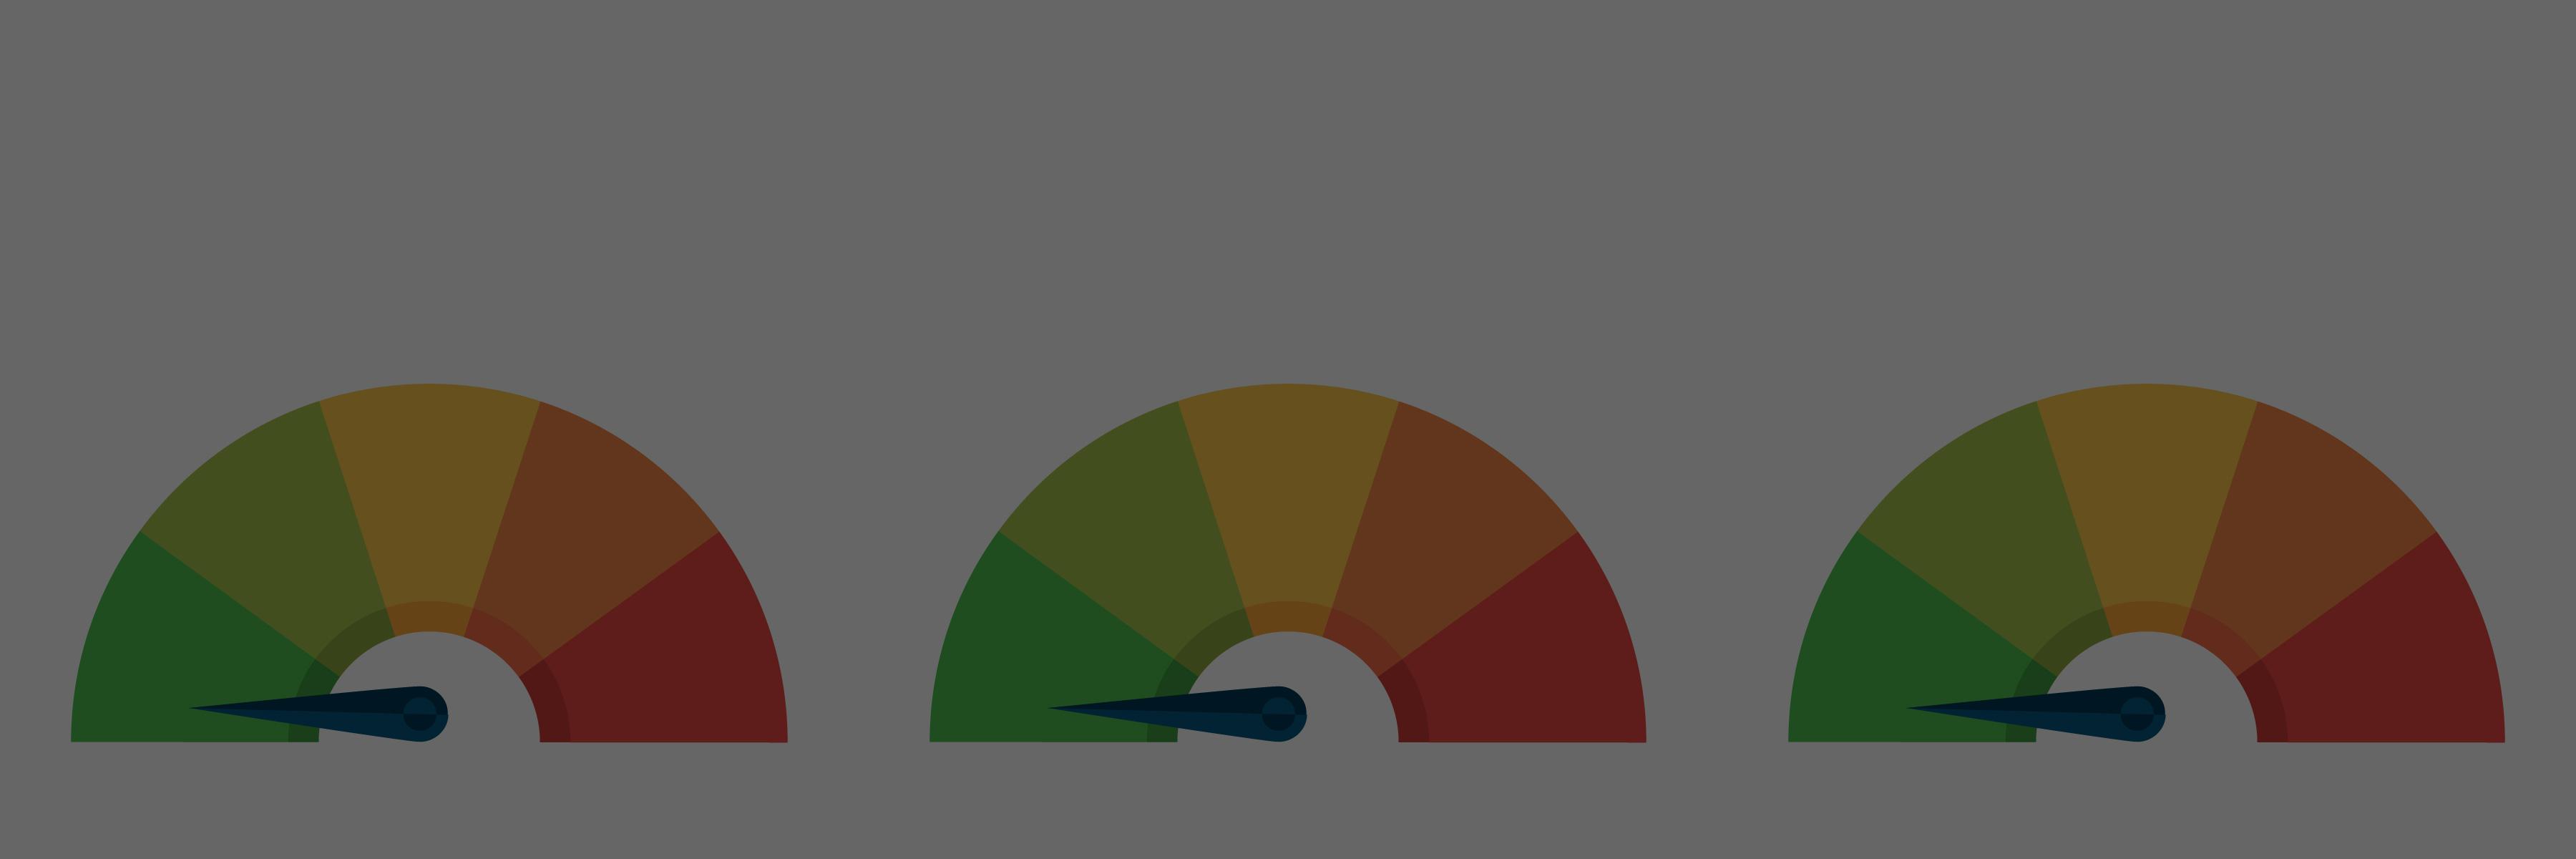 naem-webinar-2018-using-risk-ranking-to-drive-ehs-insights--min